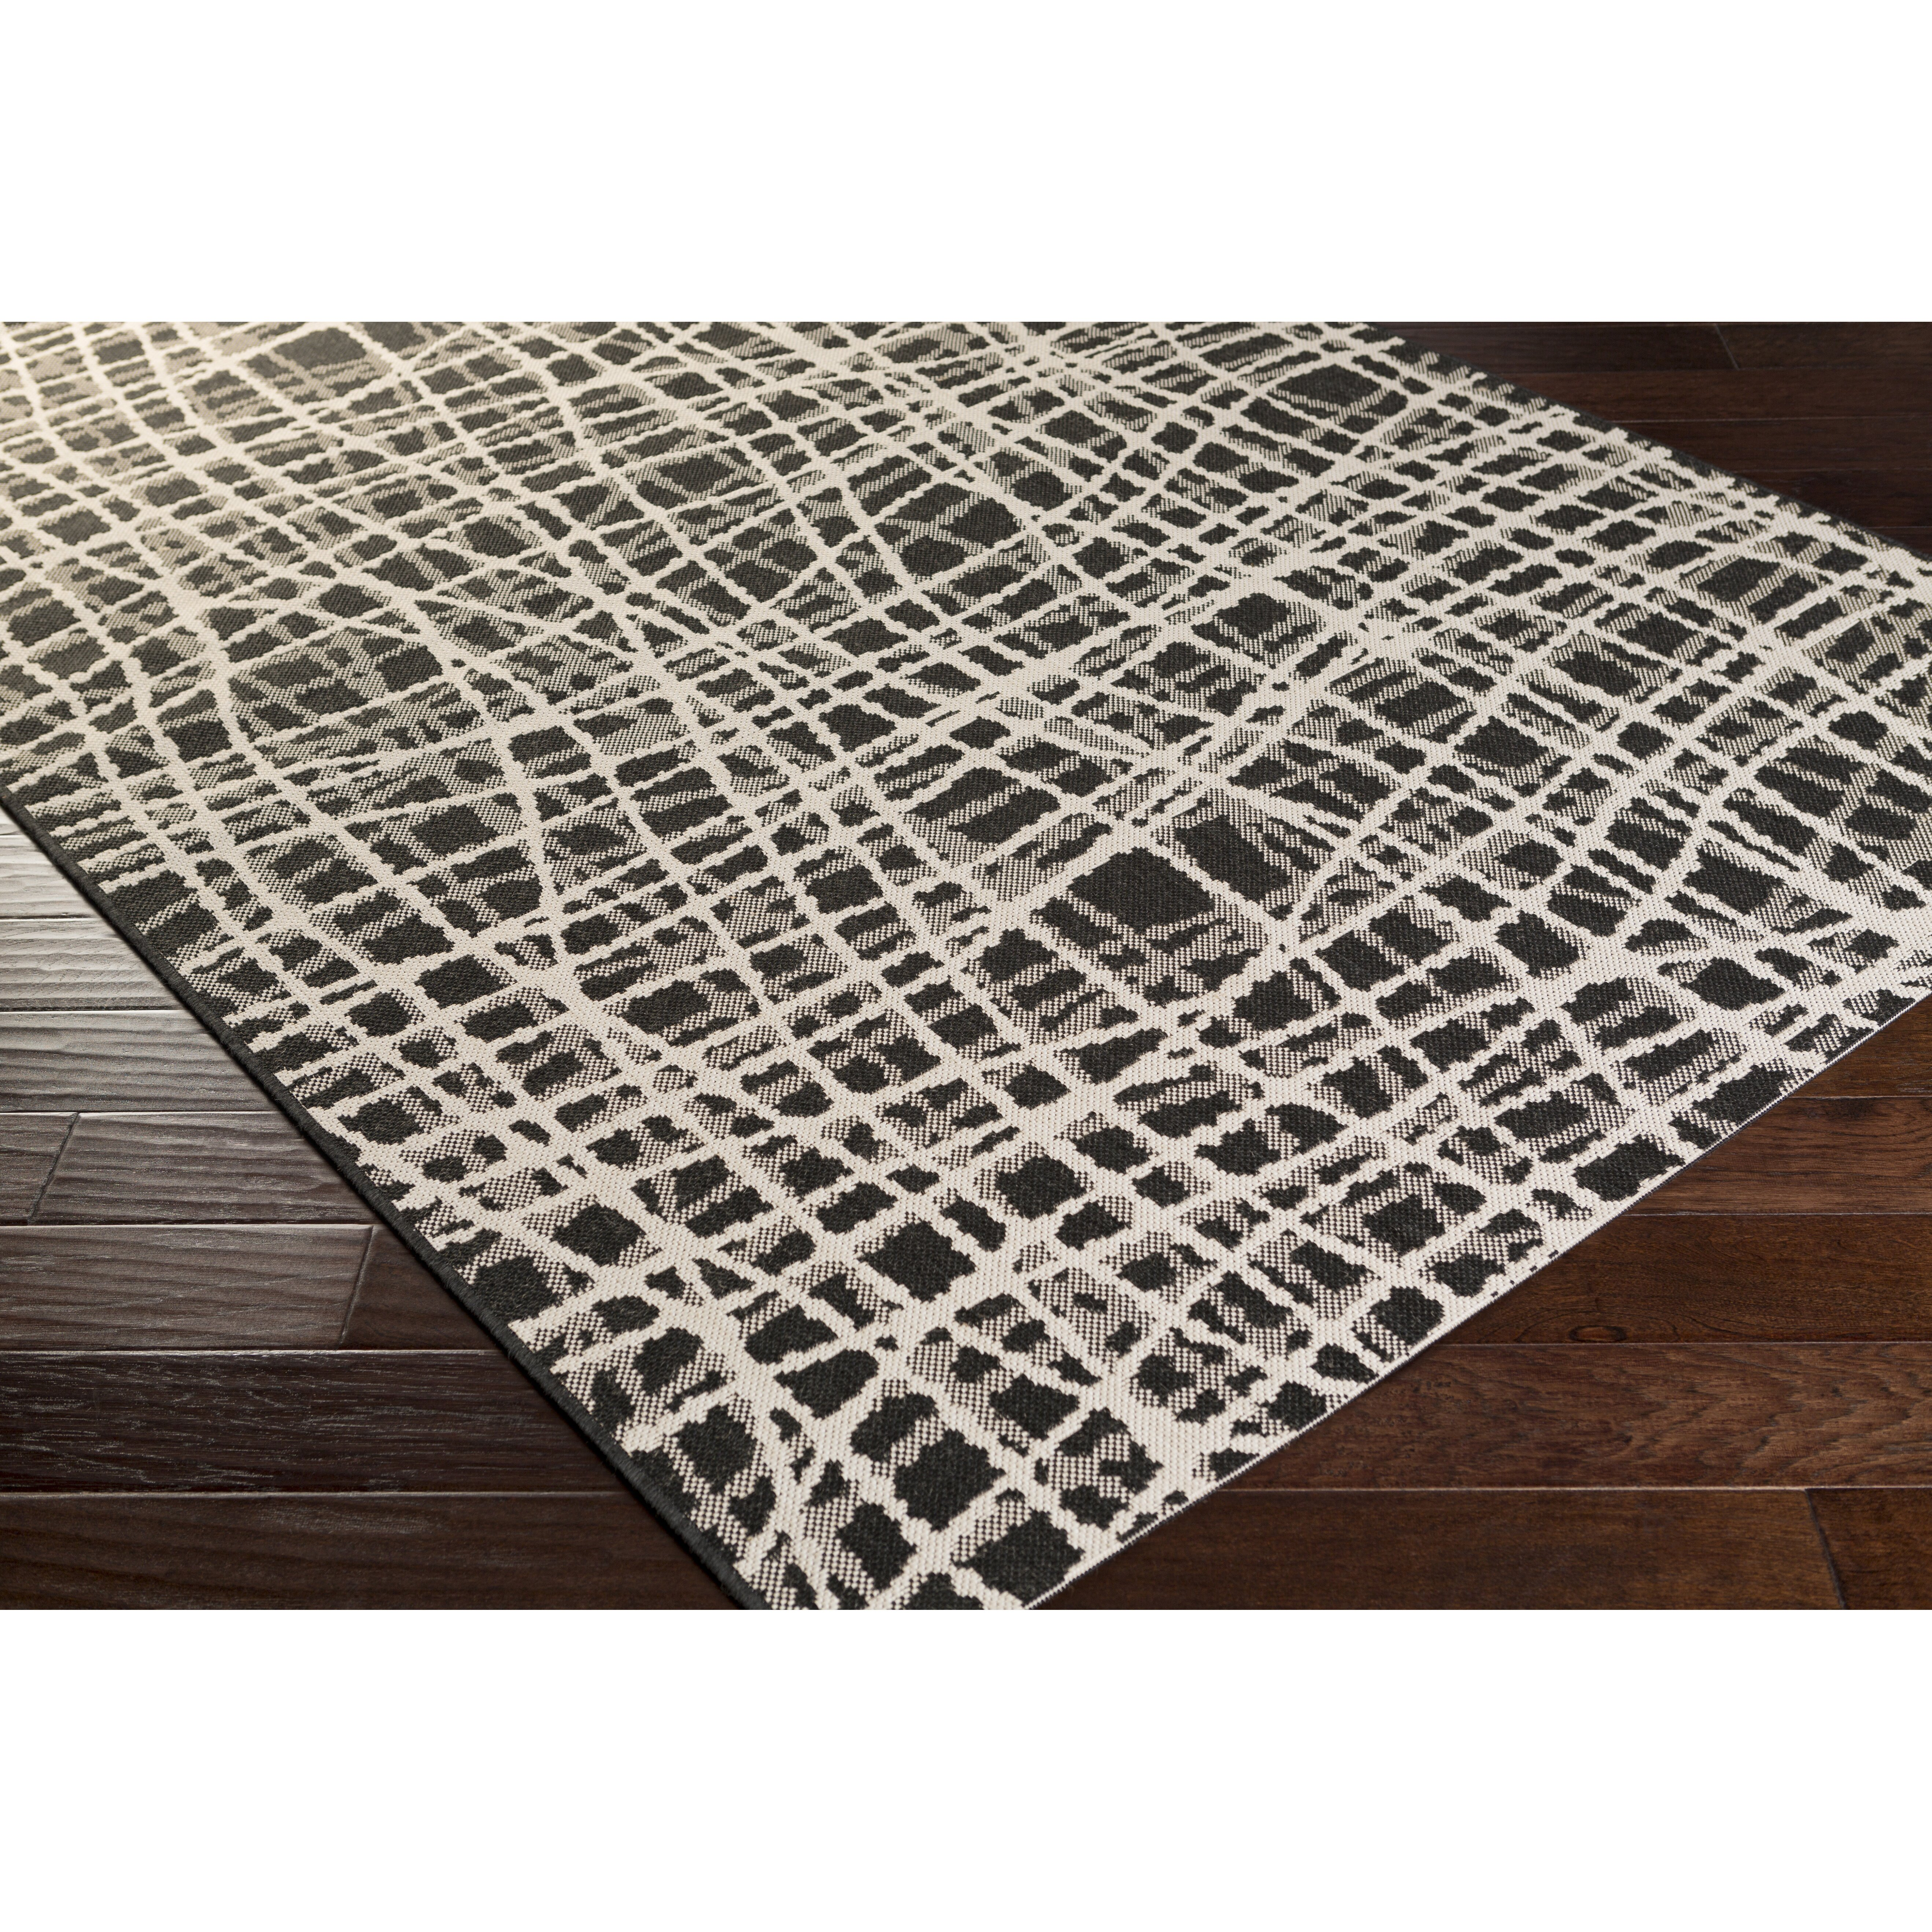 mercury row black white indoor outdoor area rug reviews wayfair. Black Bedroom Furniture Sets. Home Design Ideas